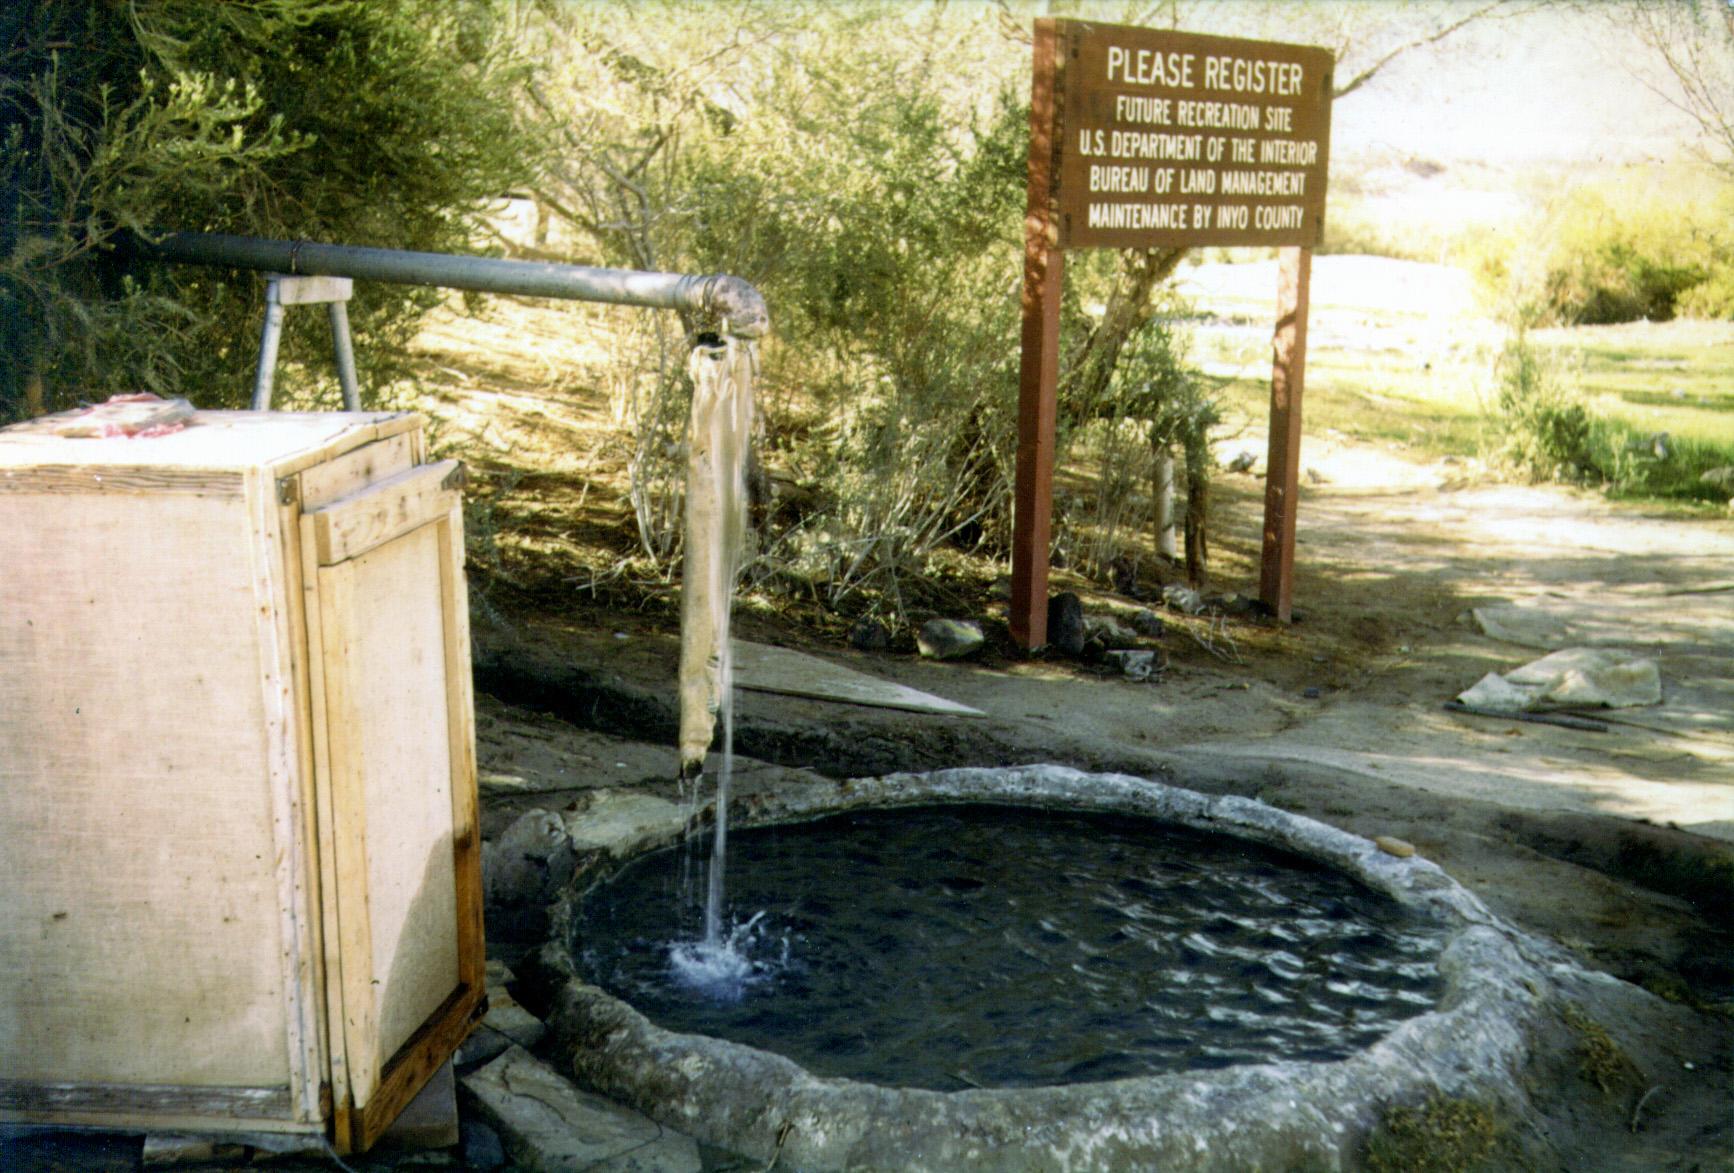 Saline Valley, Saline Chronicles, Saline Valley Hot Tubs, Lower Warm Spring